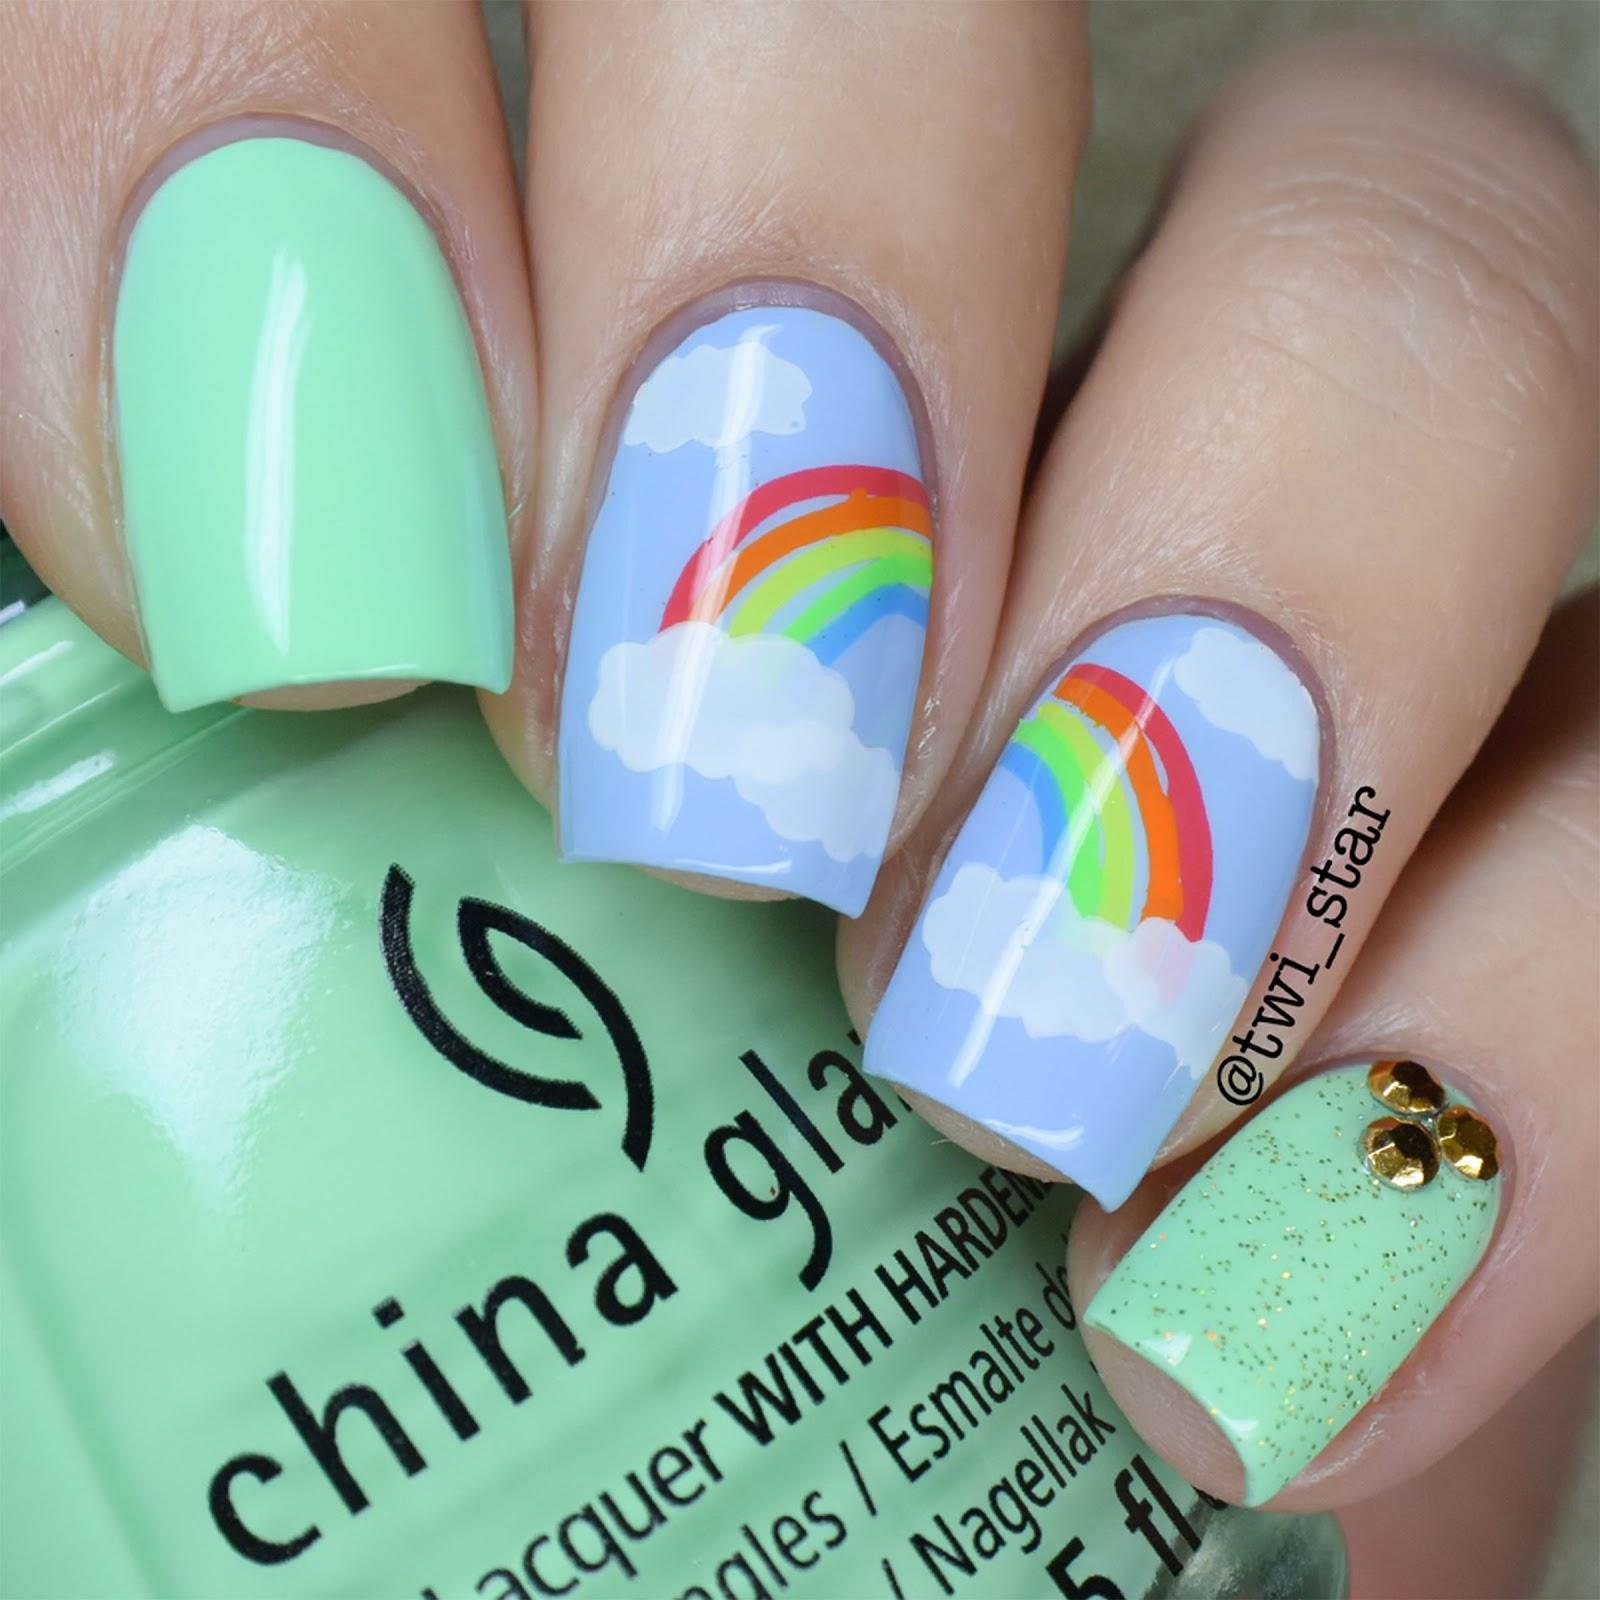 twi-star | Nail Art Blog: St. Patrick\'s Day Rainbow Stamping Nail Art!